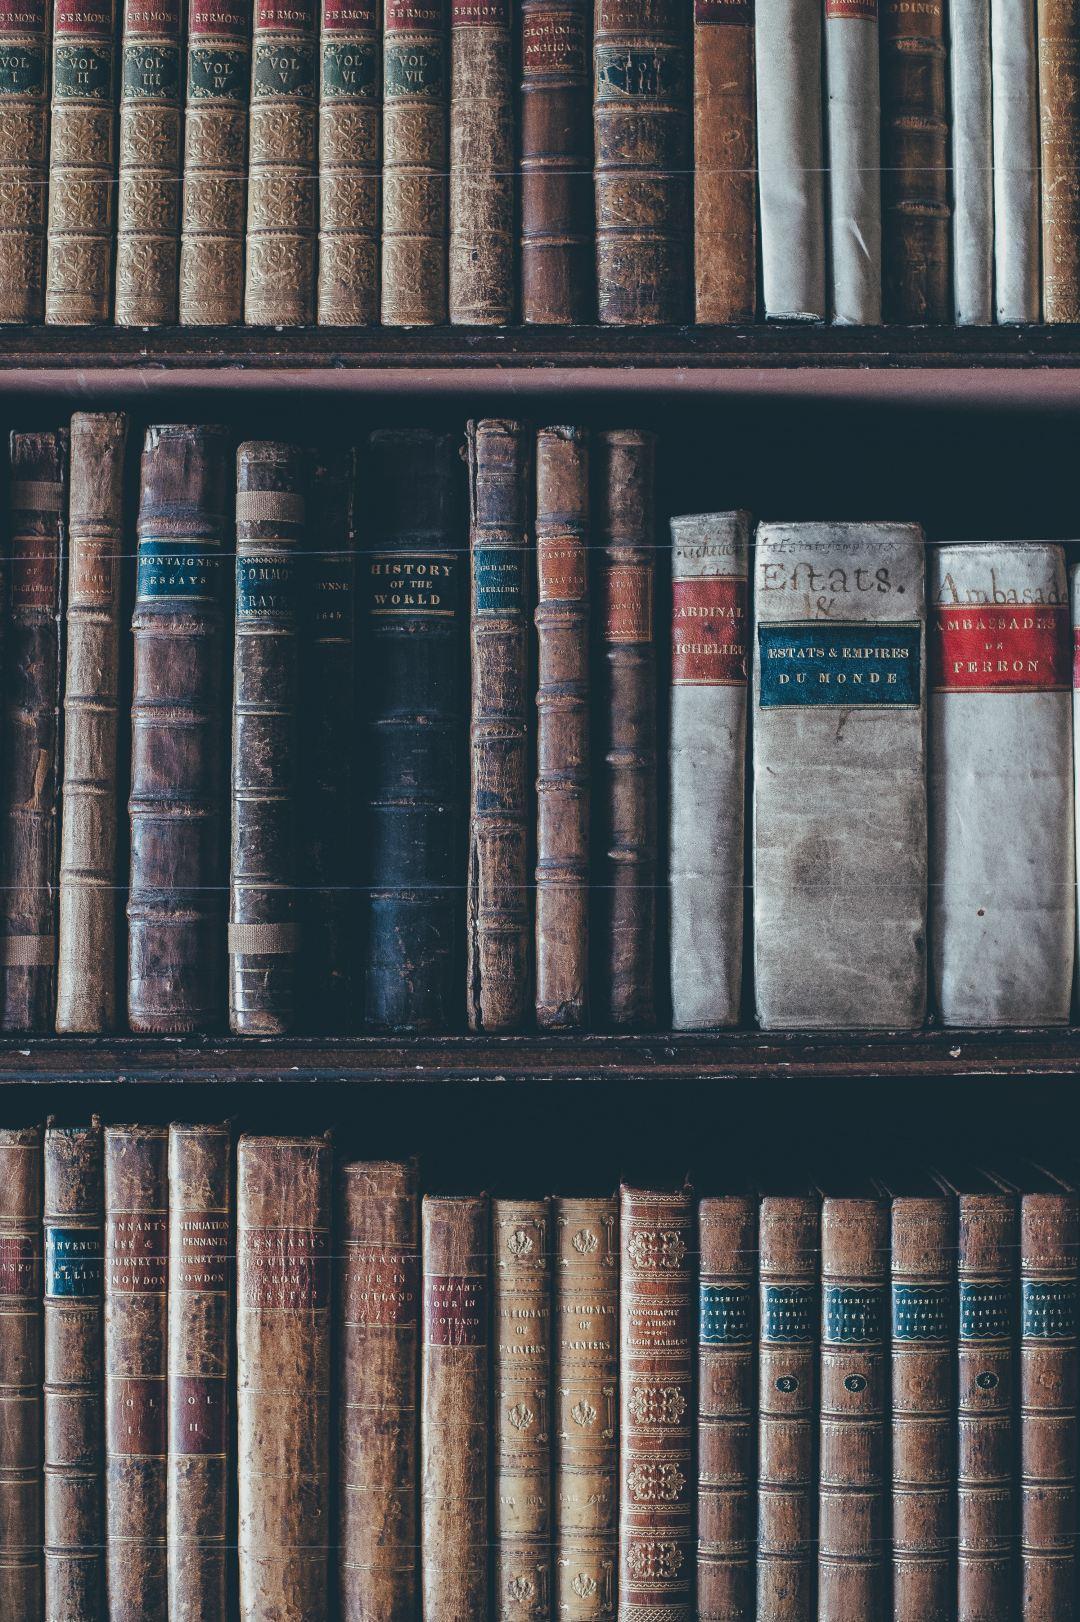 Iphone 5 Wallpaper Hd Shelves Antique Books And Encyclopedias Photo By Annie Spratt